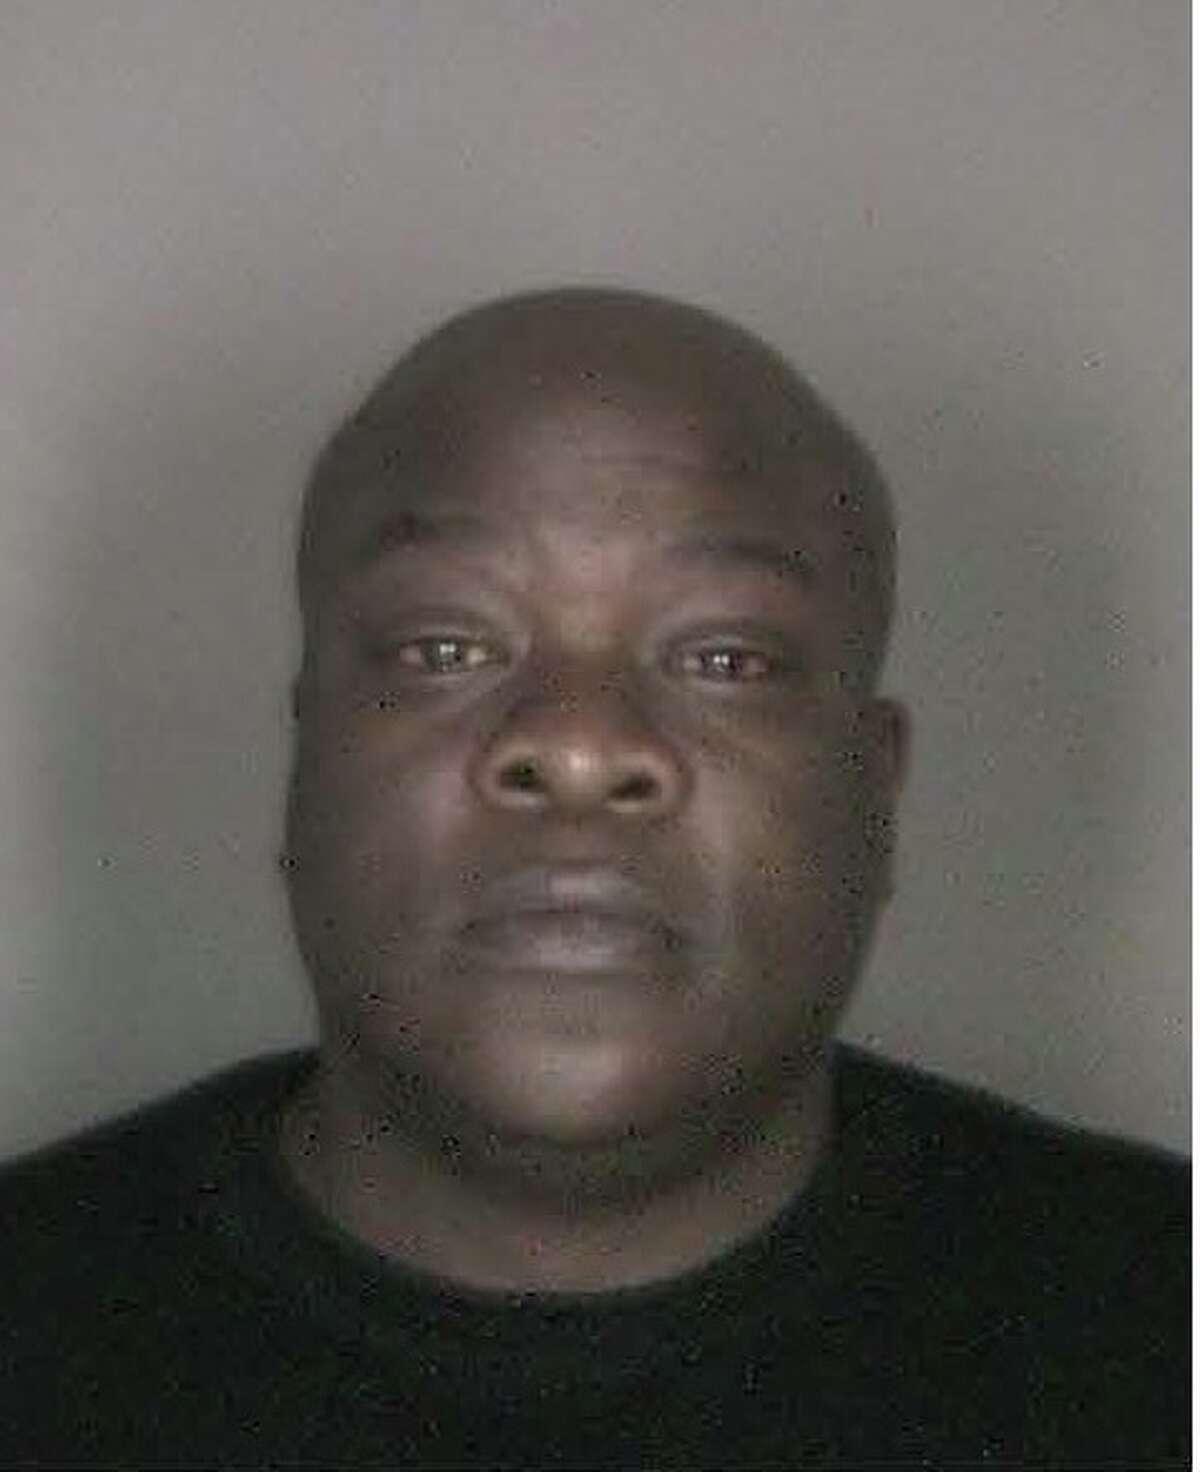 Jerry J. Slaughter (East Greenbush police)